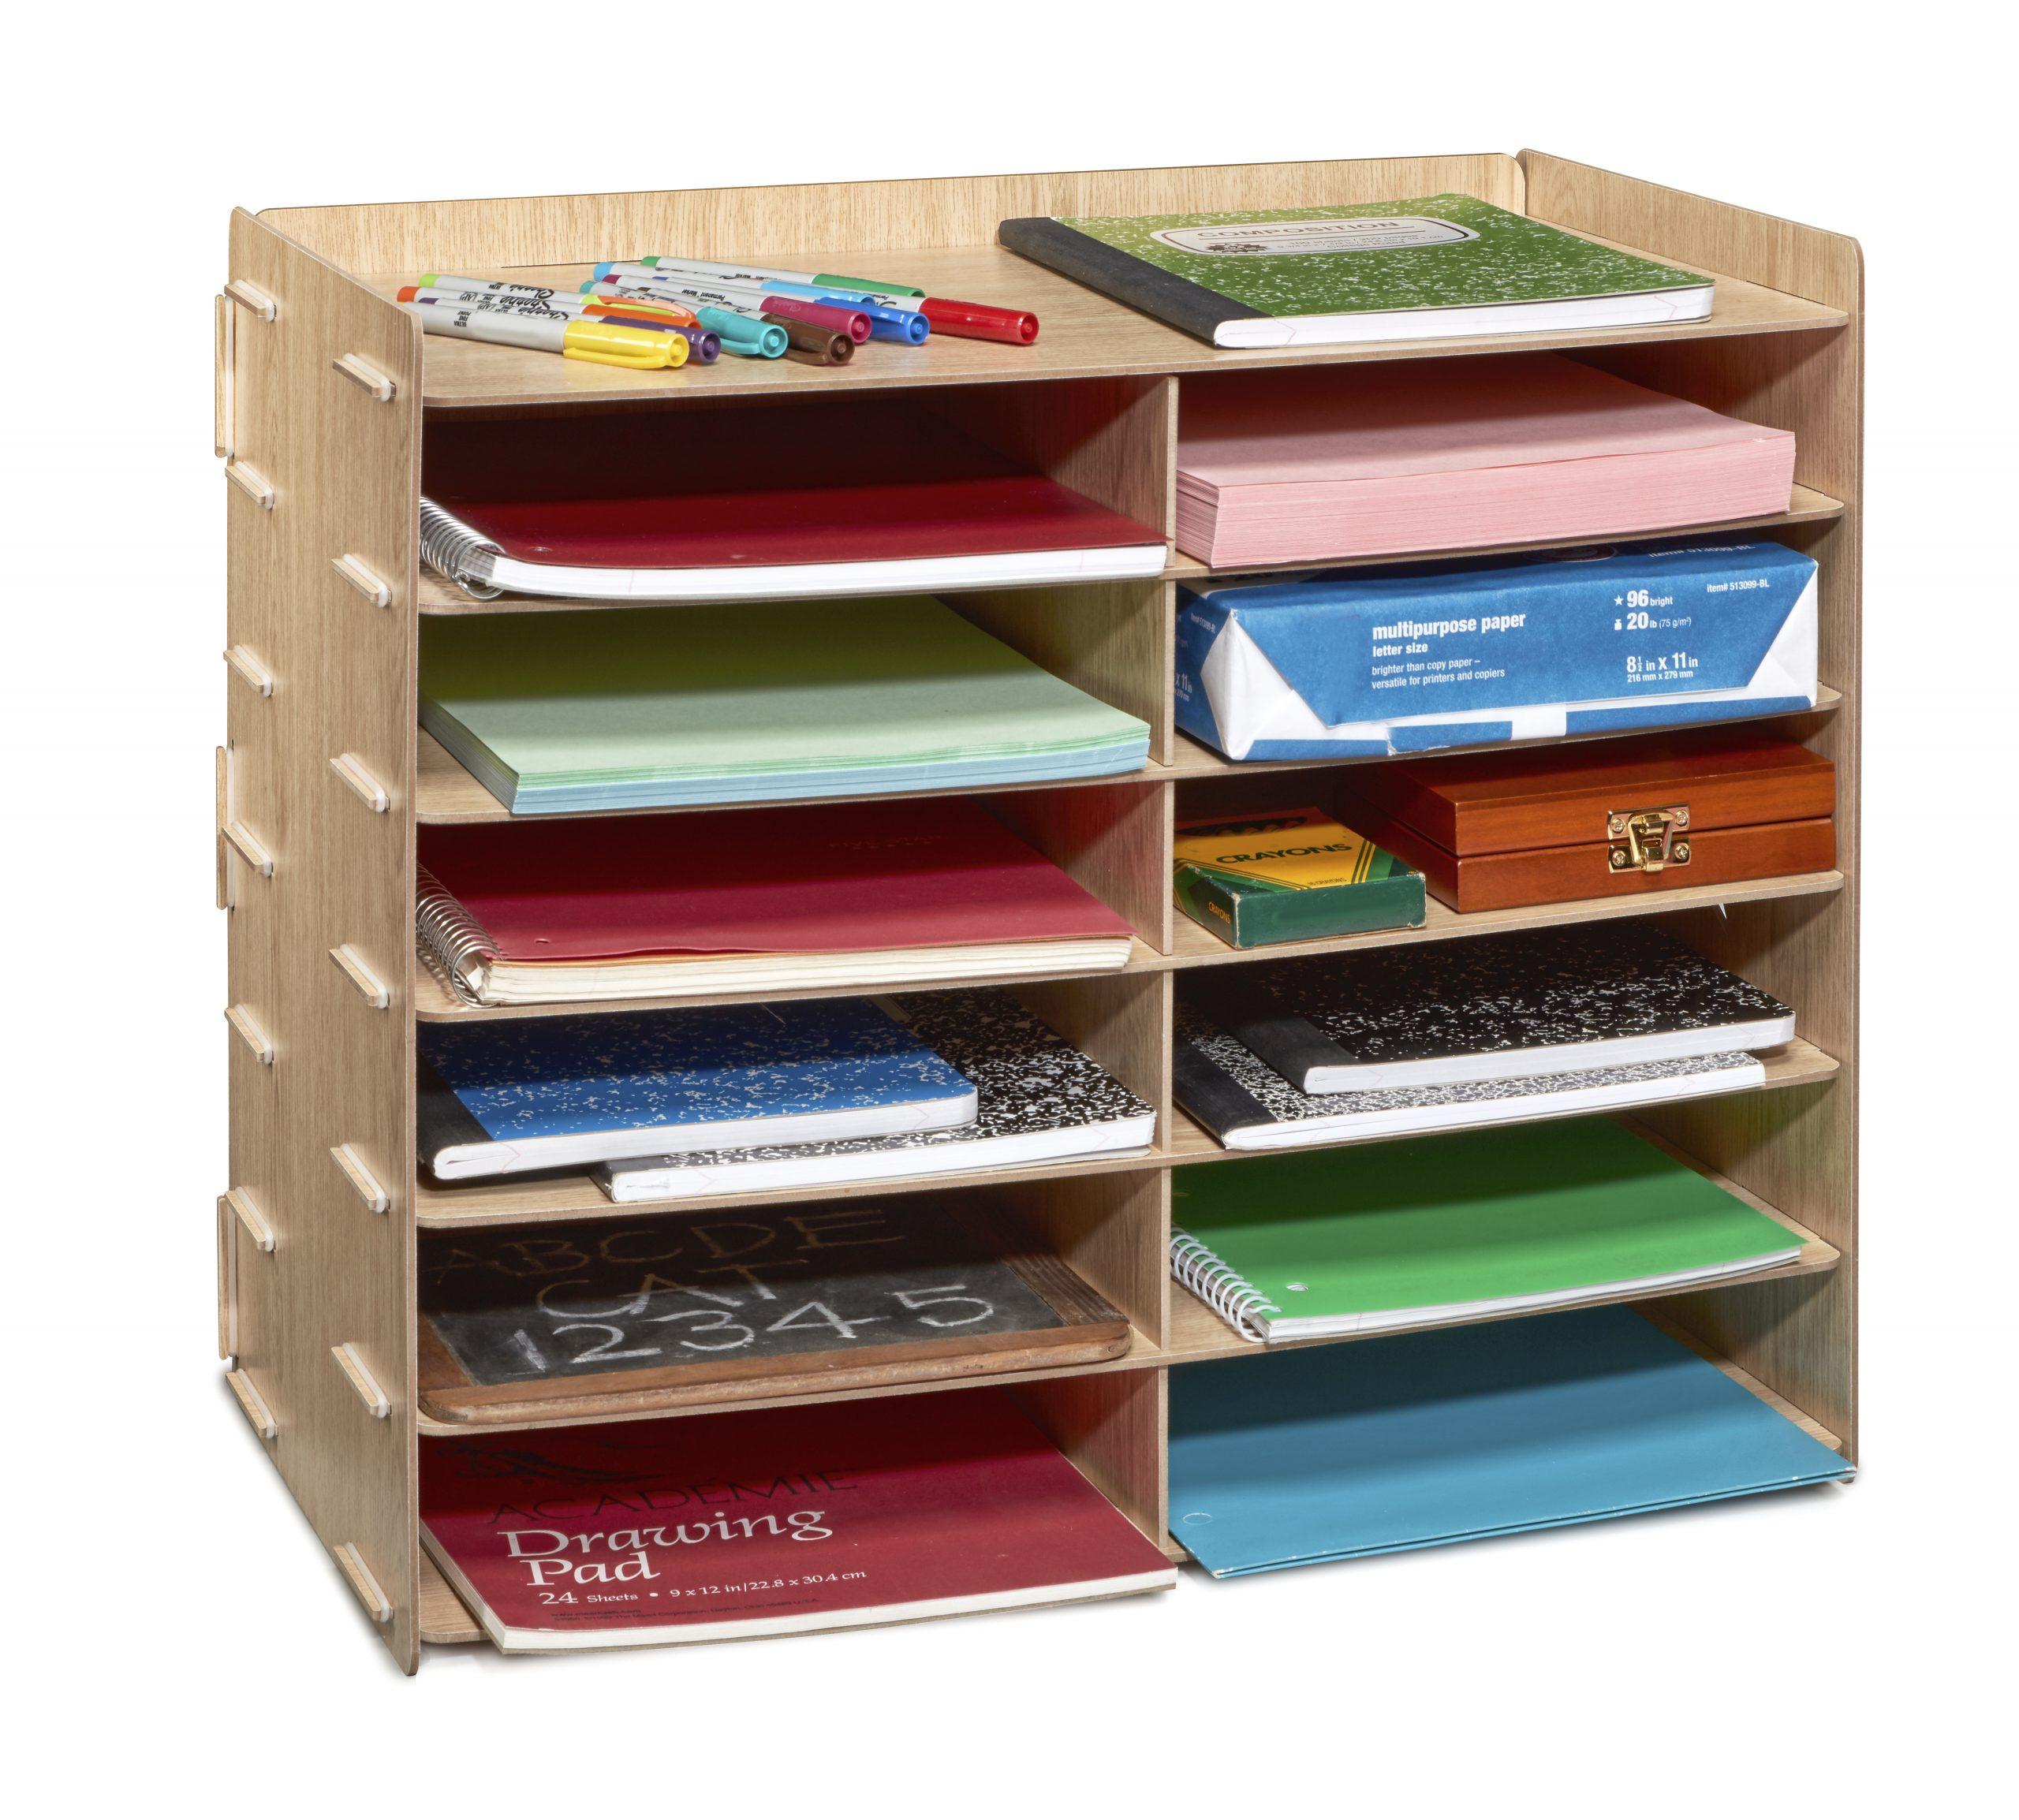 The AdirOffice 12 Compartment Paper Sorter